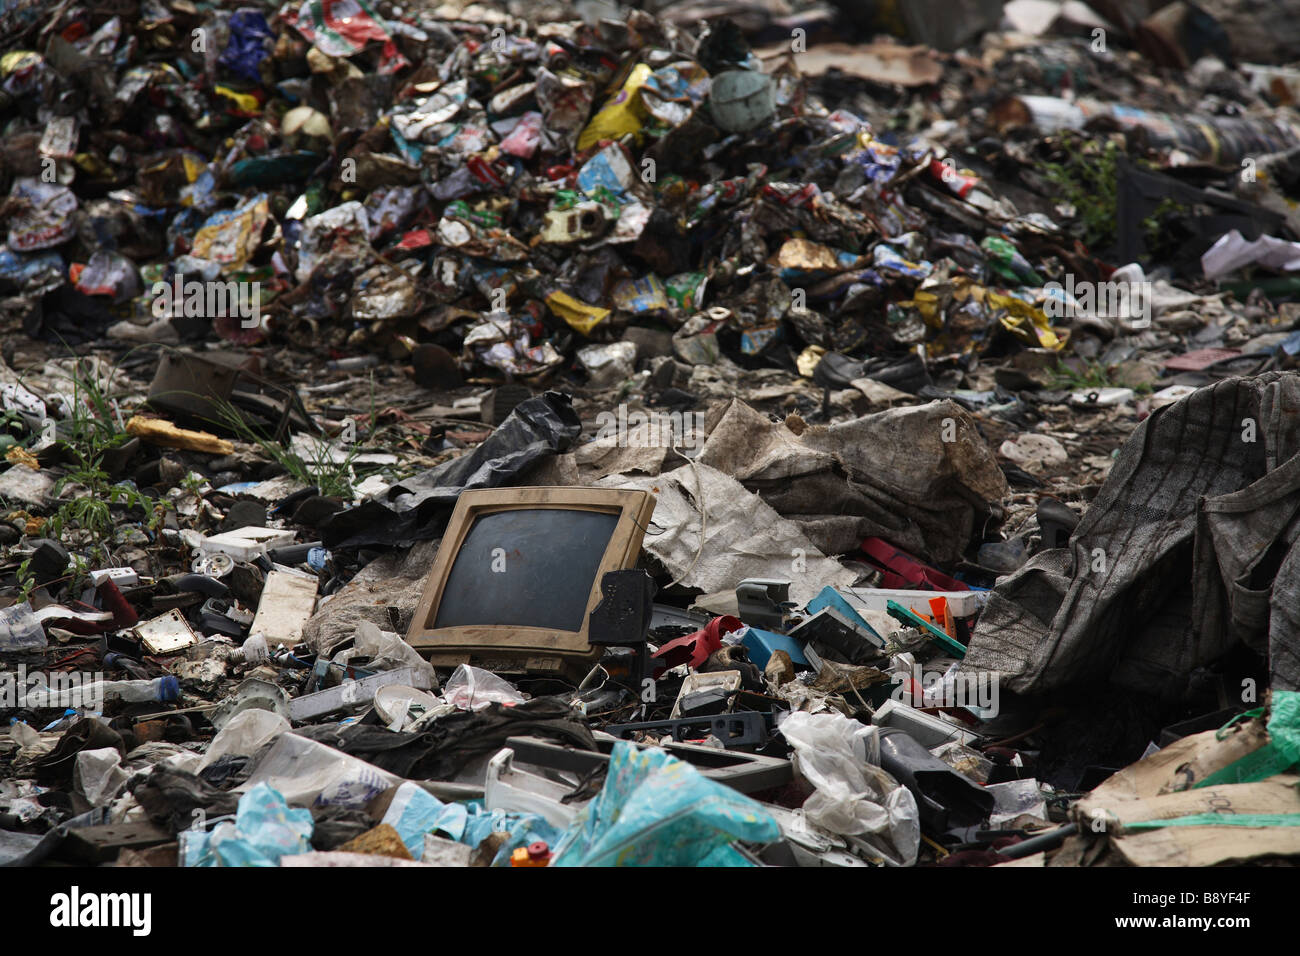 In generale i rifiuti e i rifiuti elettronici a Olusosum discarica a Lagos, Nigeria. Immagini Stock